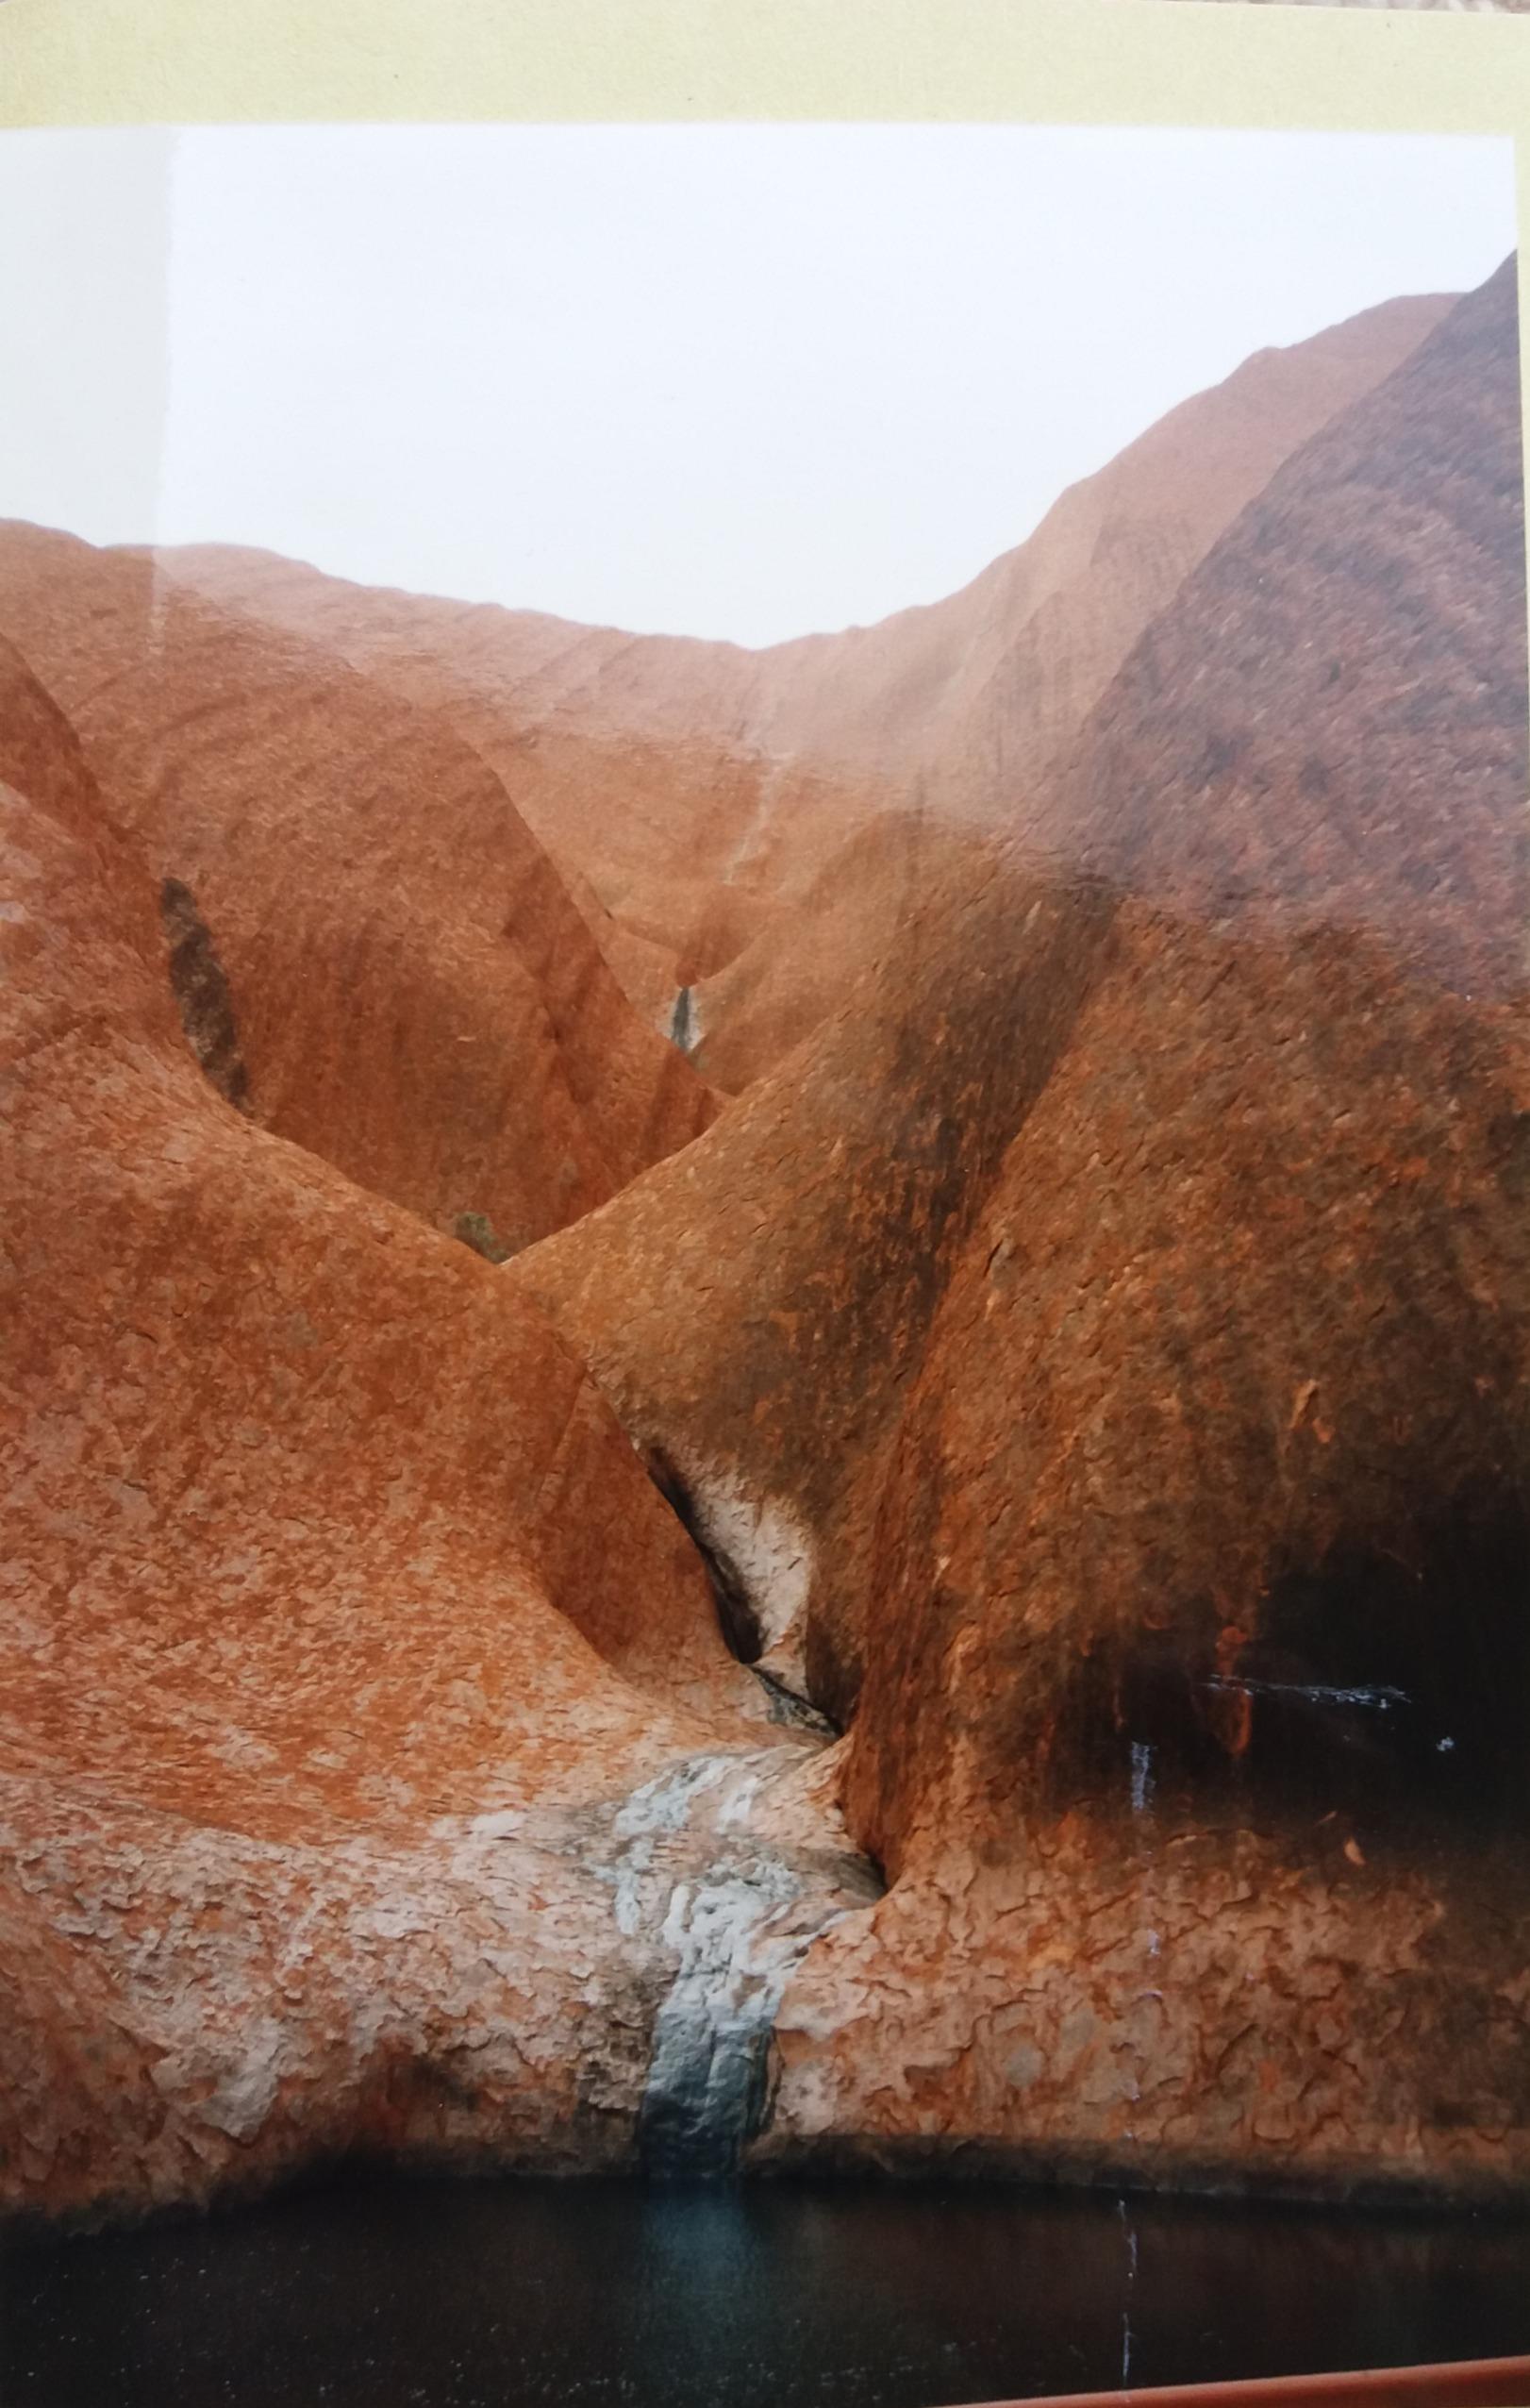 Australia diary - Day 8 - Uluru